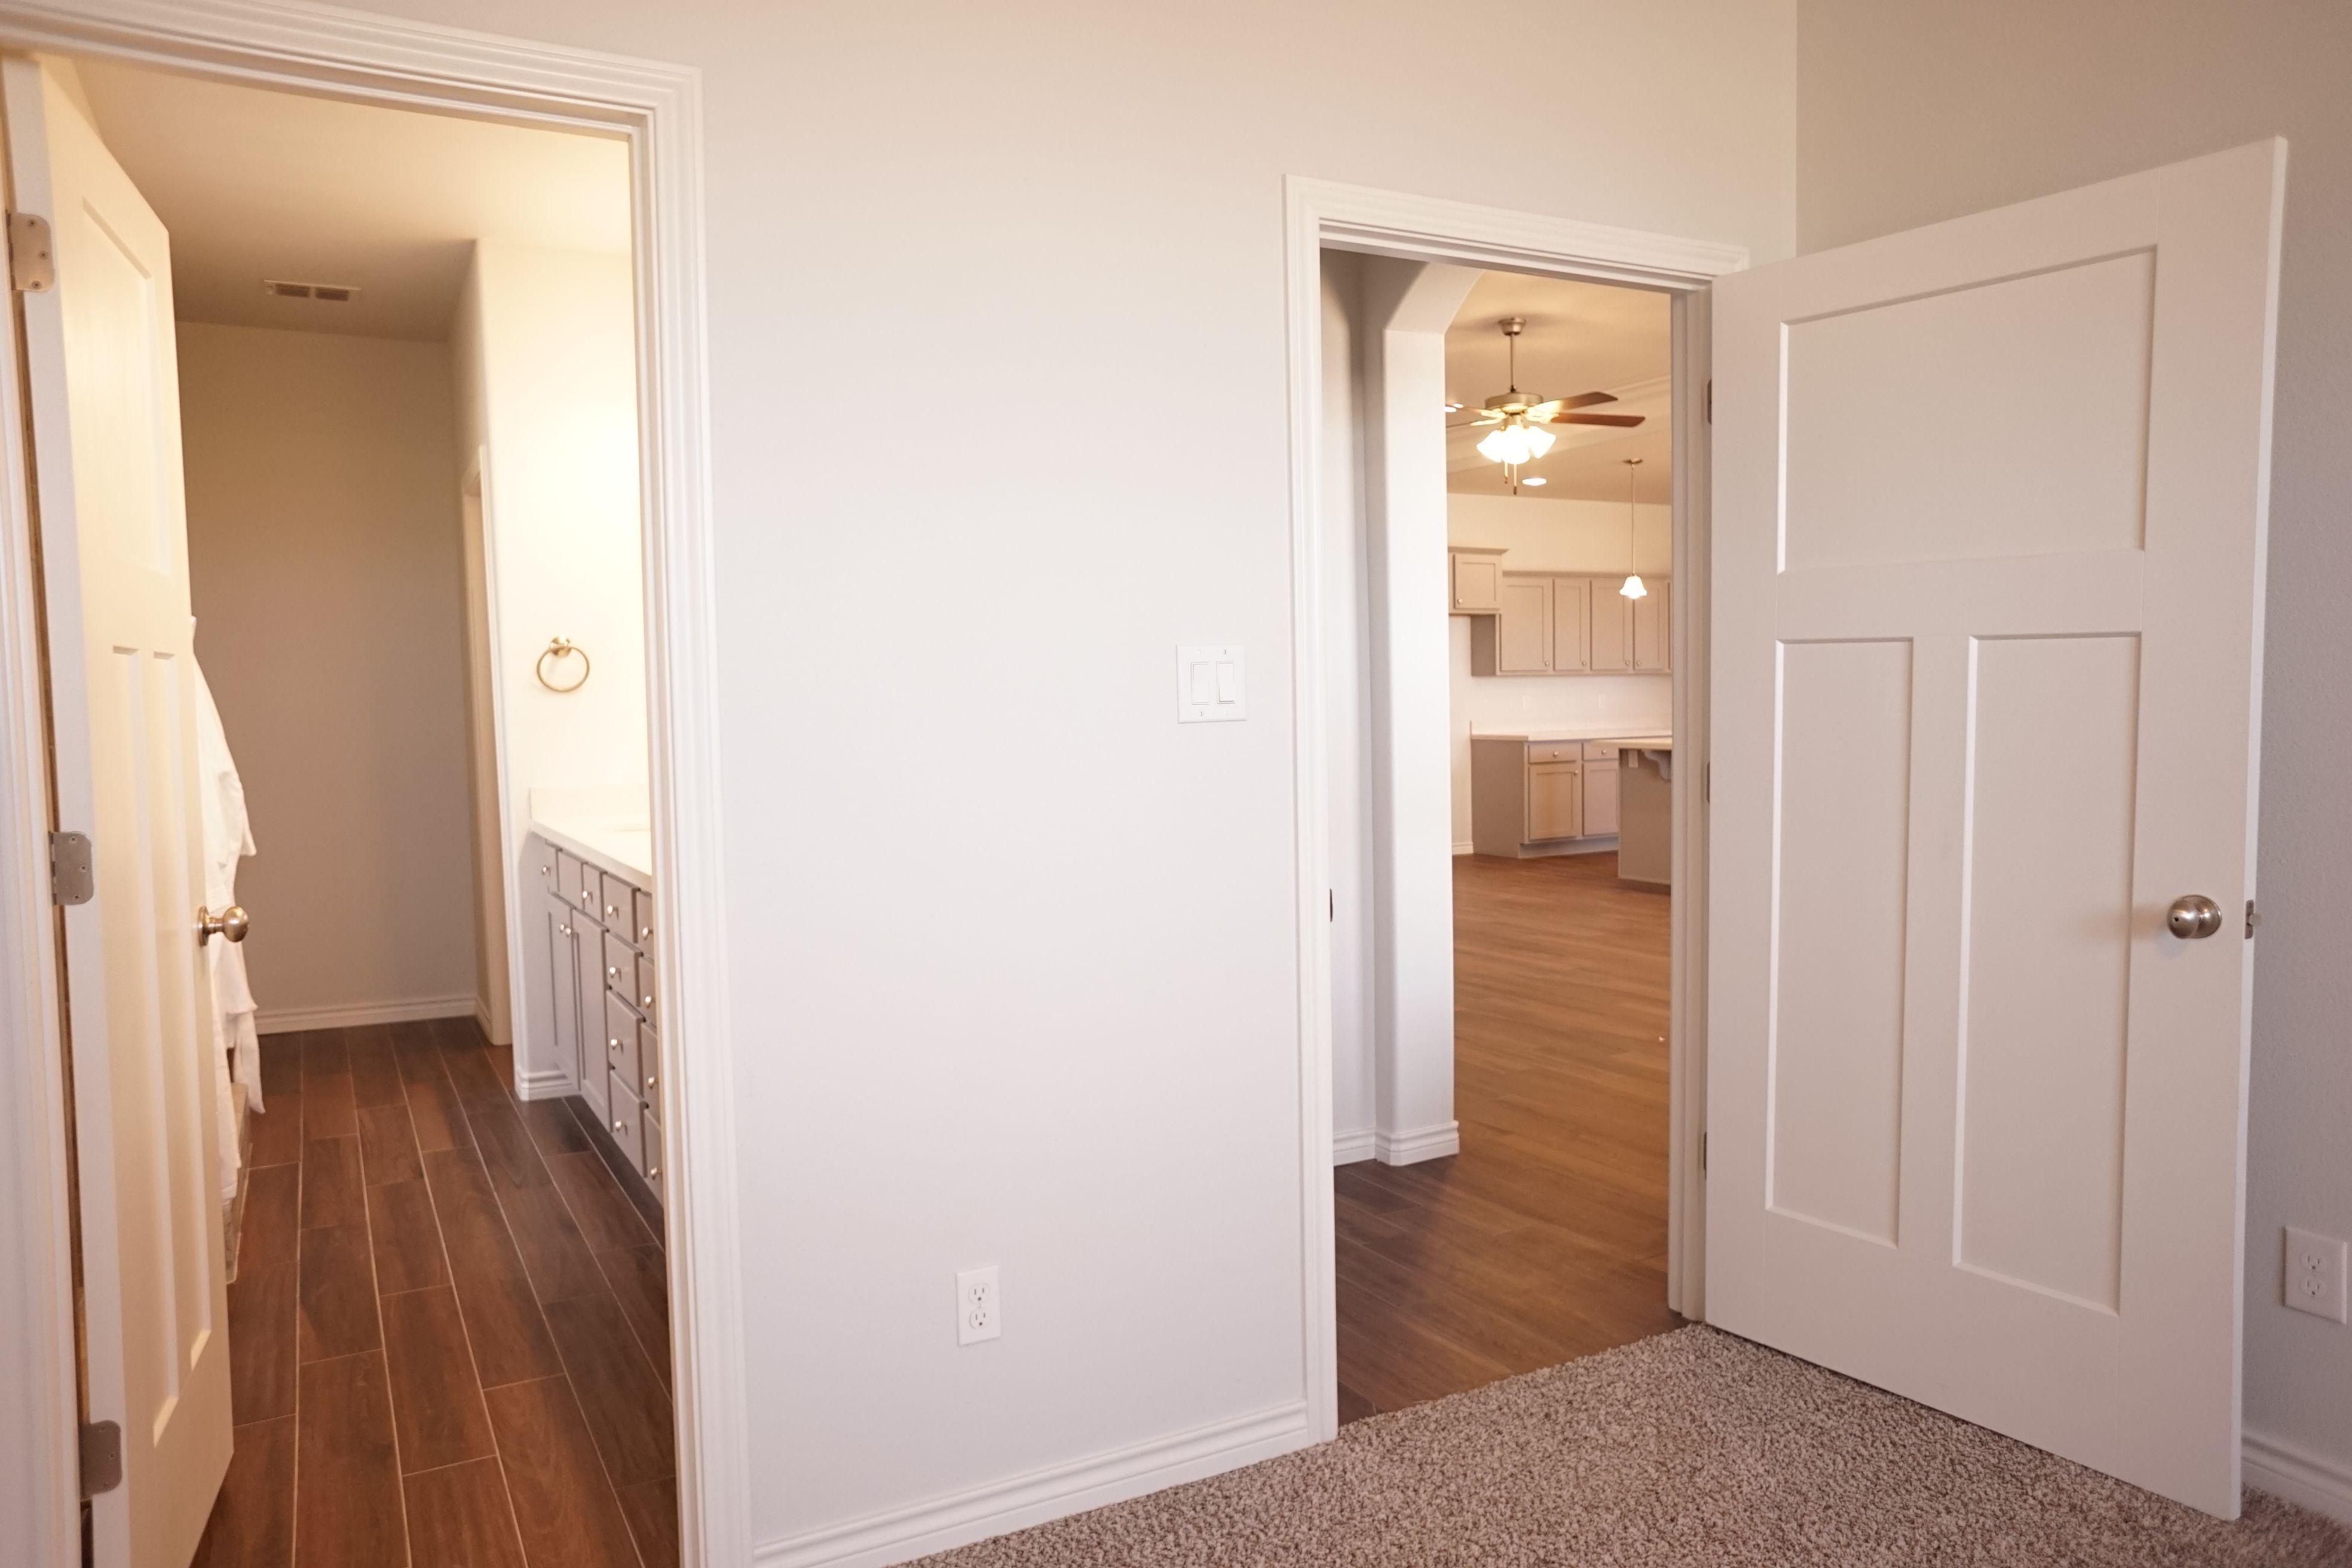 craftsman interior doors manufactured by jeldwen built by